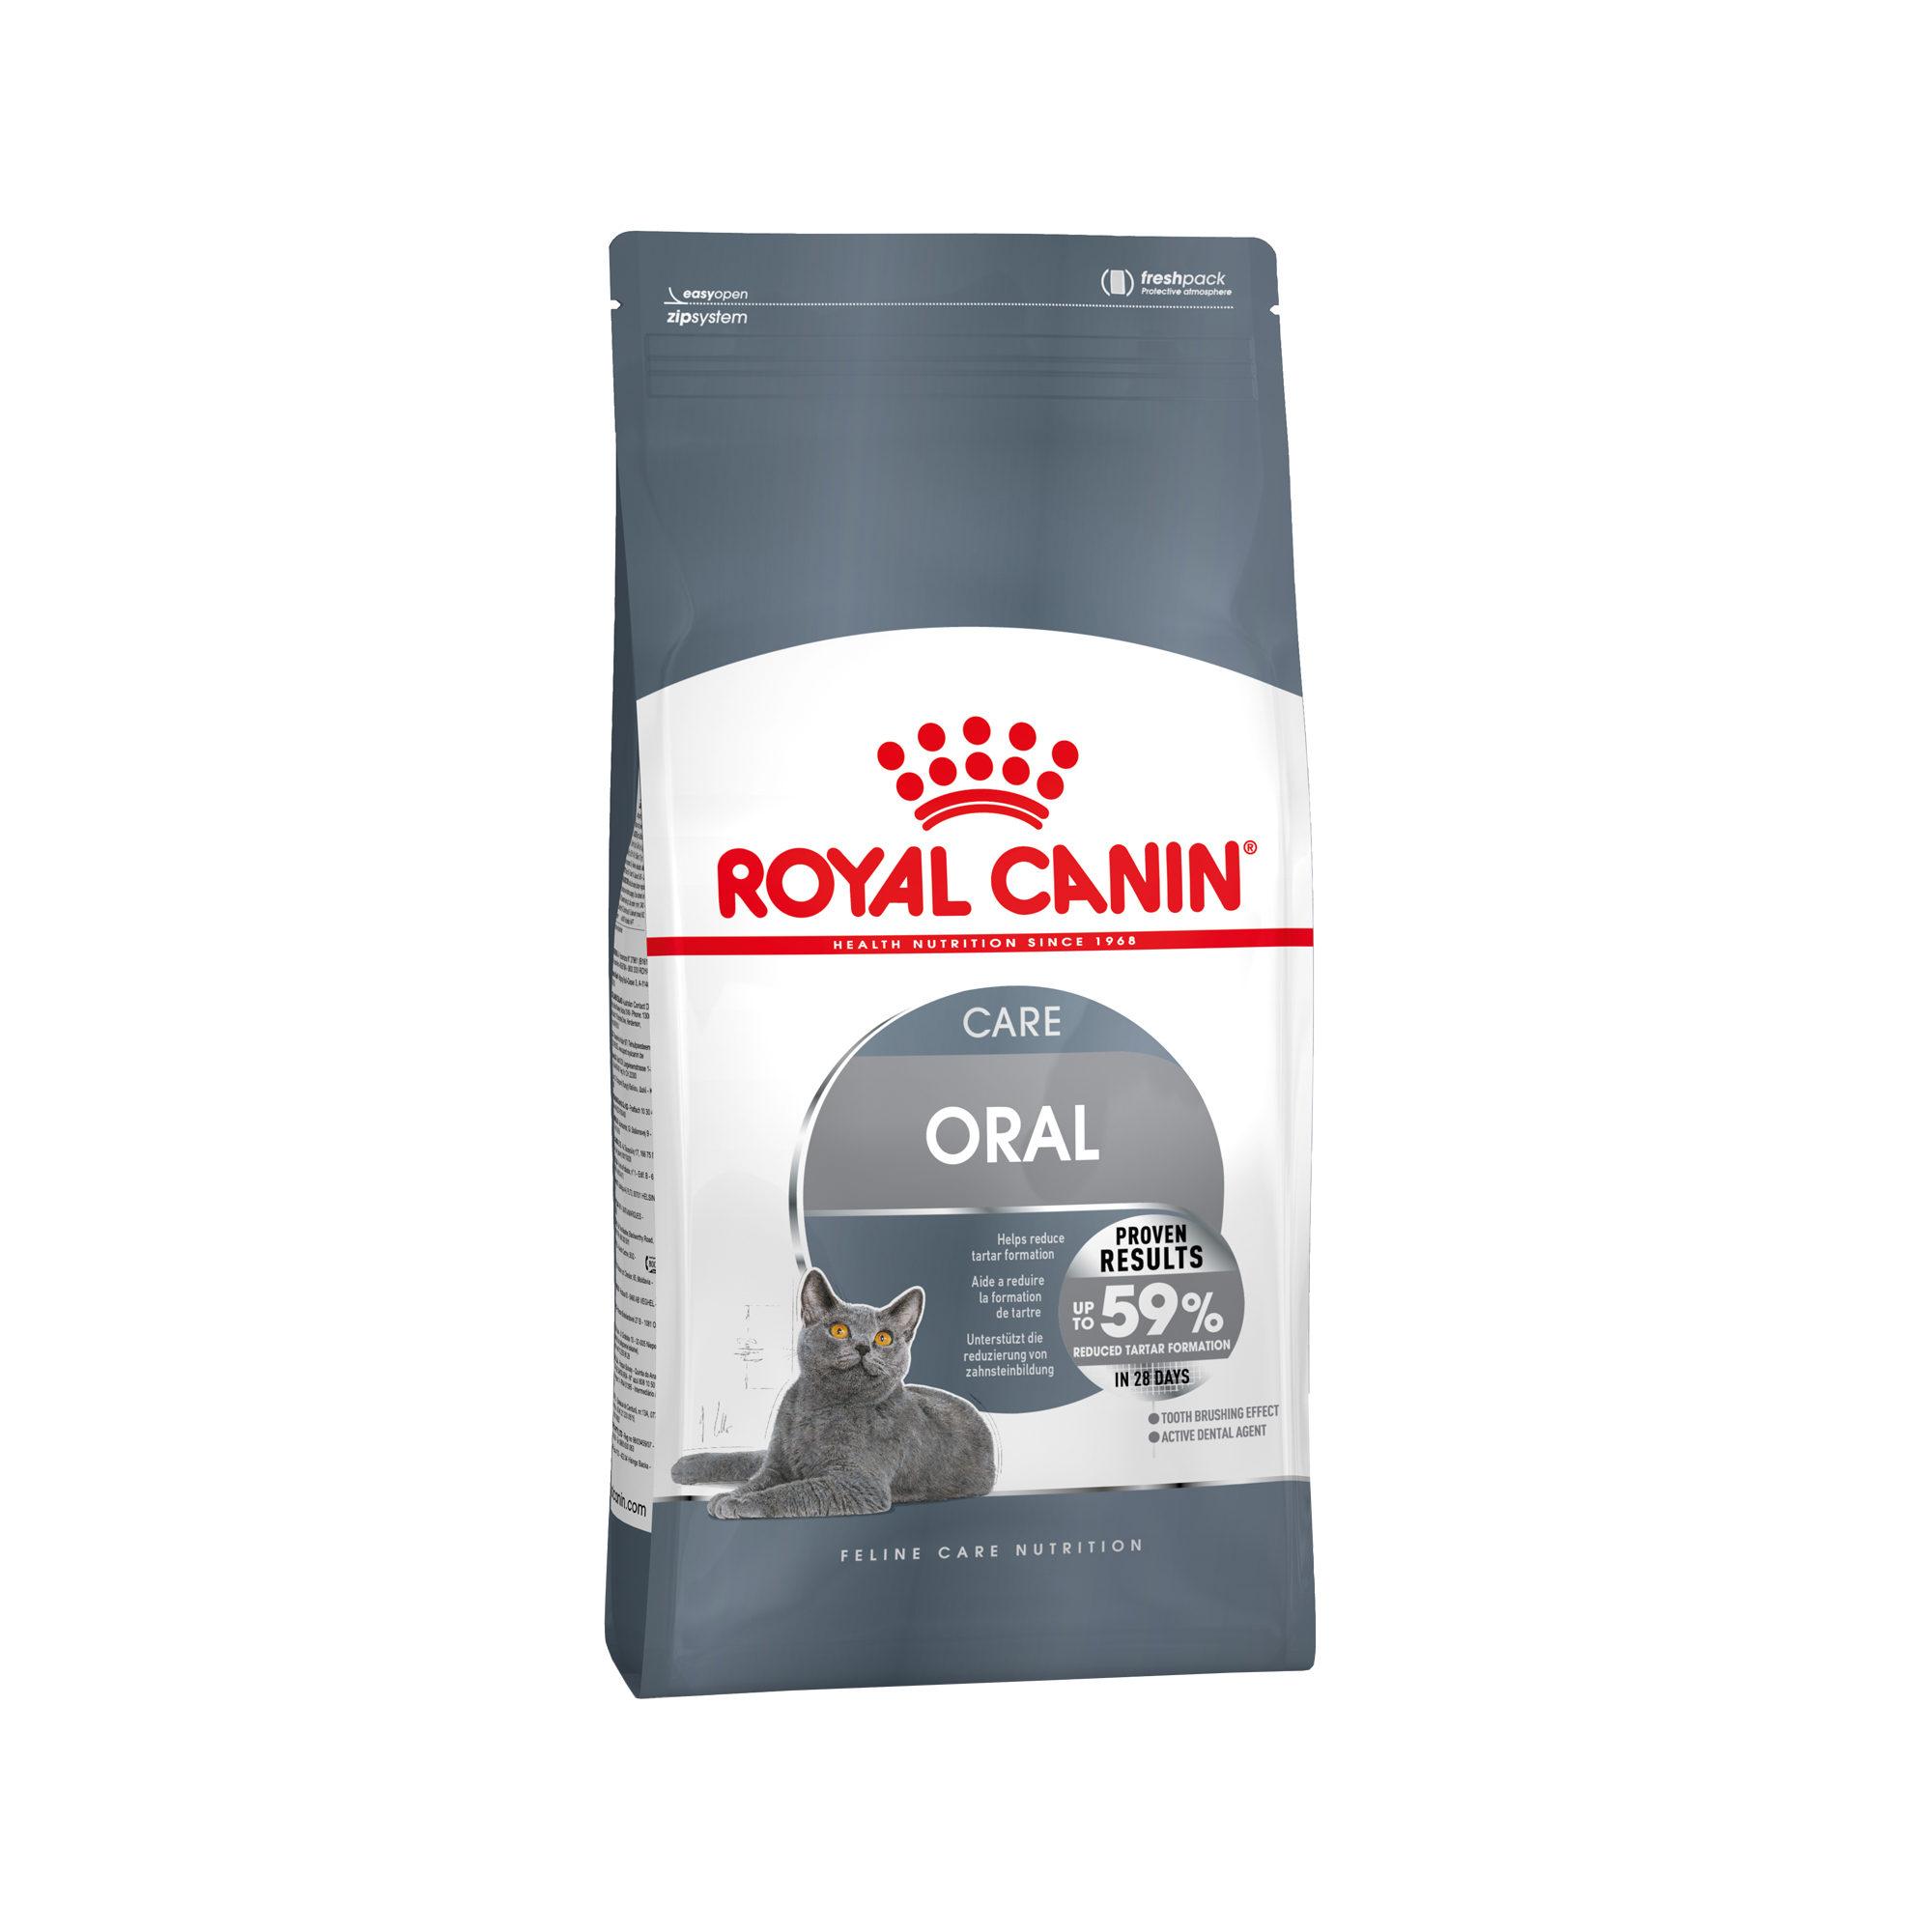 Royal Canin Oral Care Katzenfutter